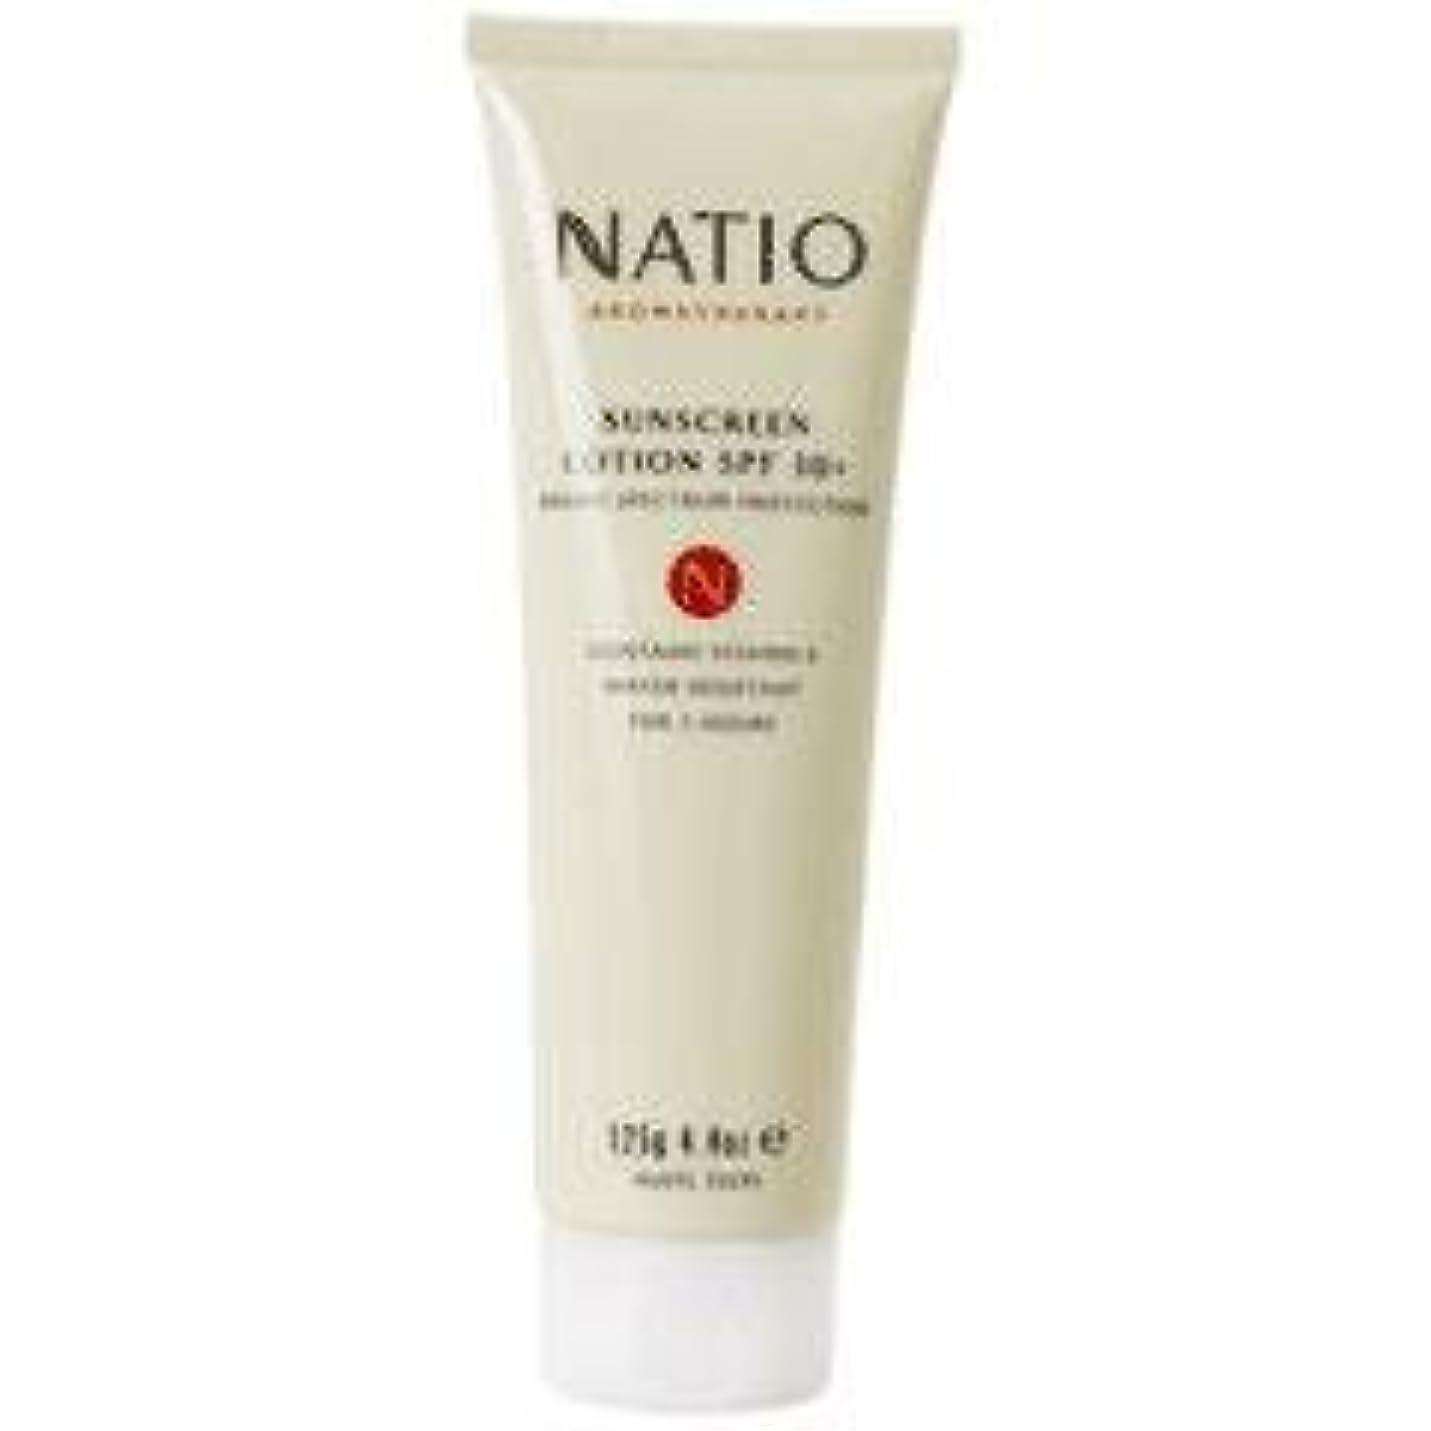 【NATIO Aromatherapy Sunscreen Lotion SPF30+】 ナティオ  日焼け止めクリーム SPF30+ [海外直送品]